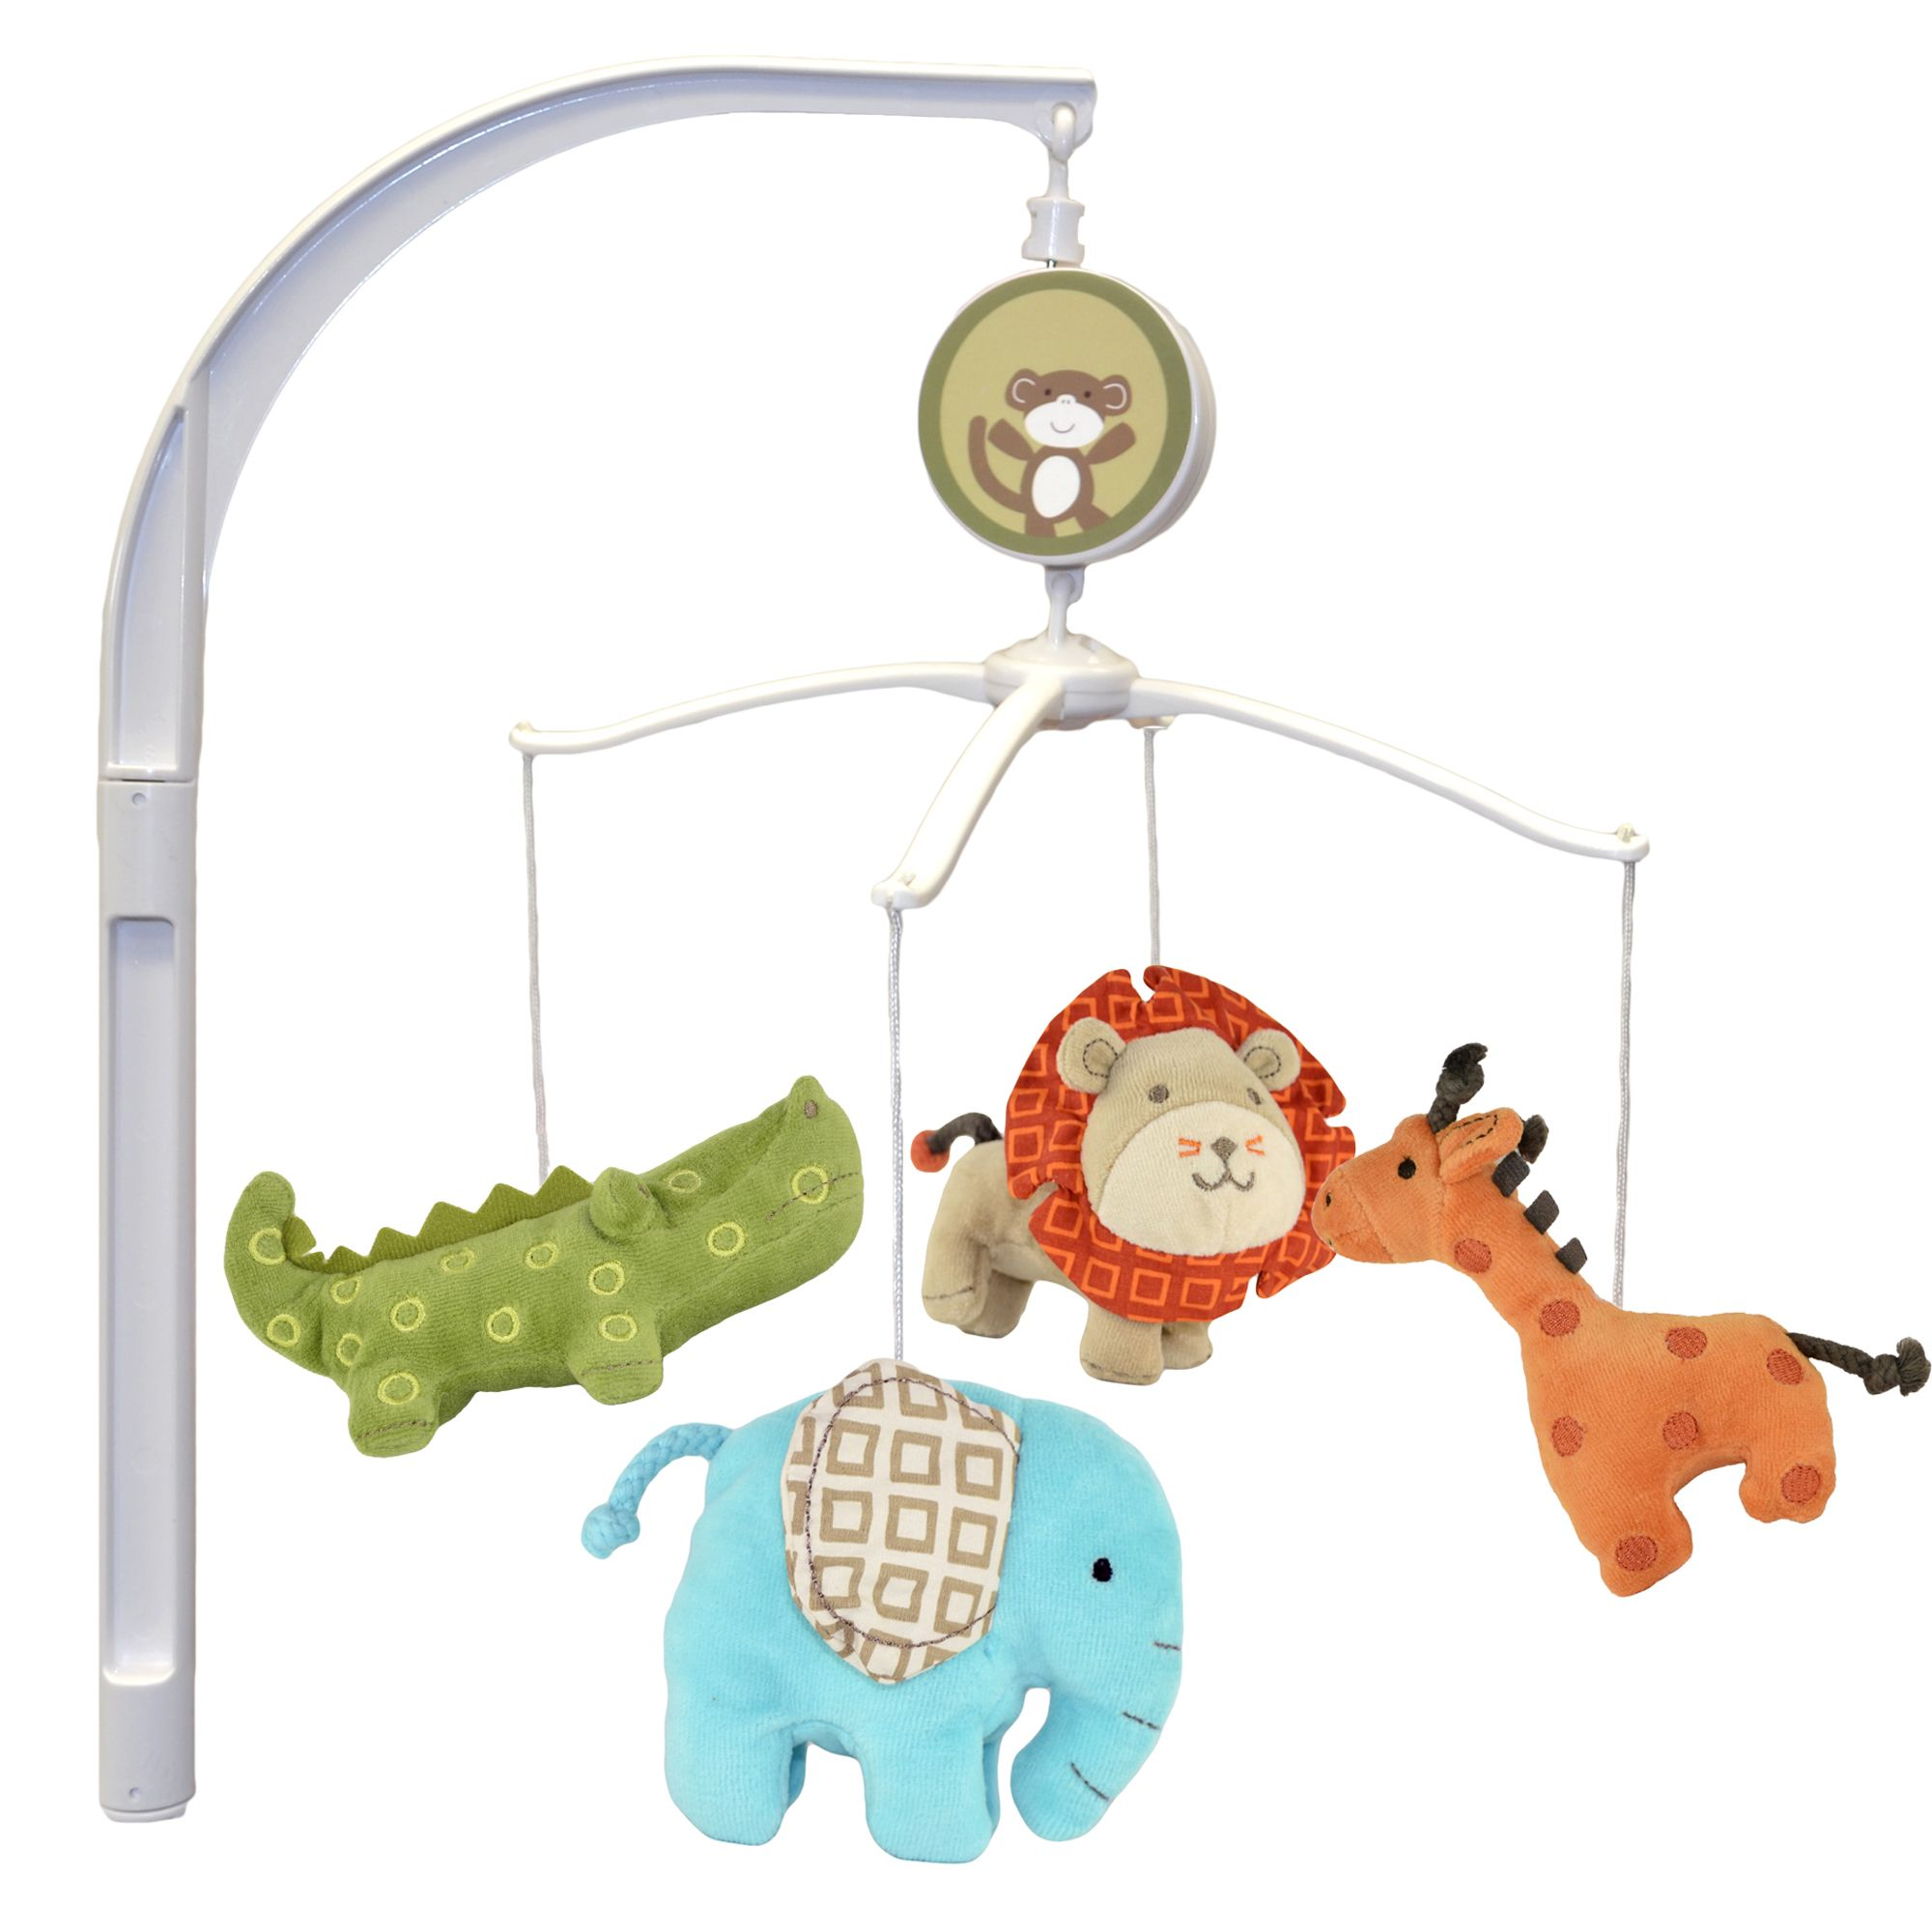 Cuddletime Jungle Jubilee Mobile Nursery